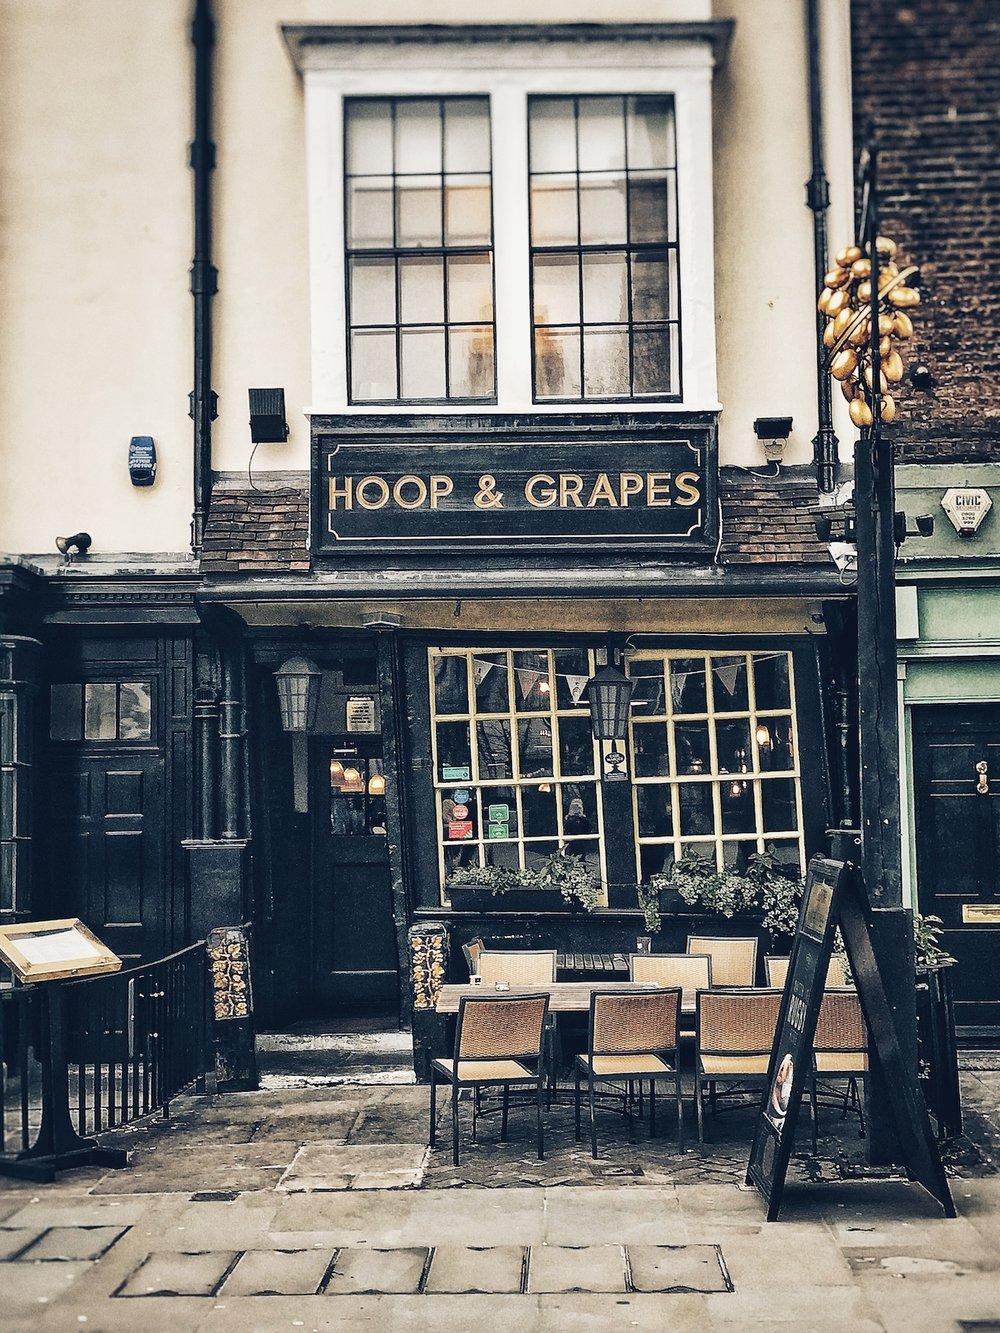 Hoop & Grapes Pub London